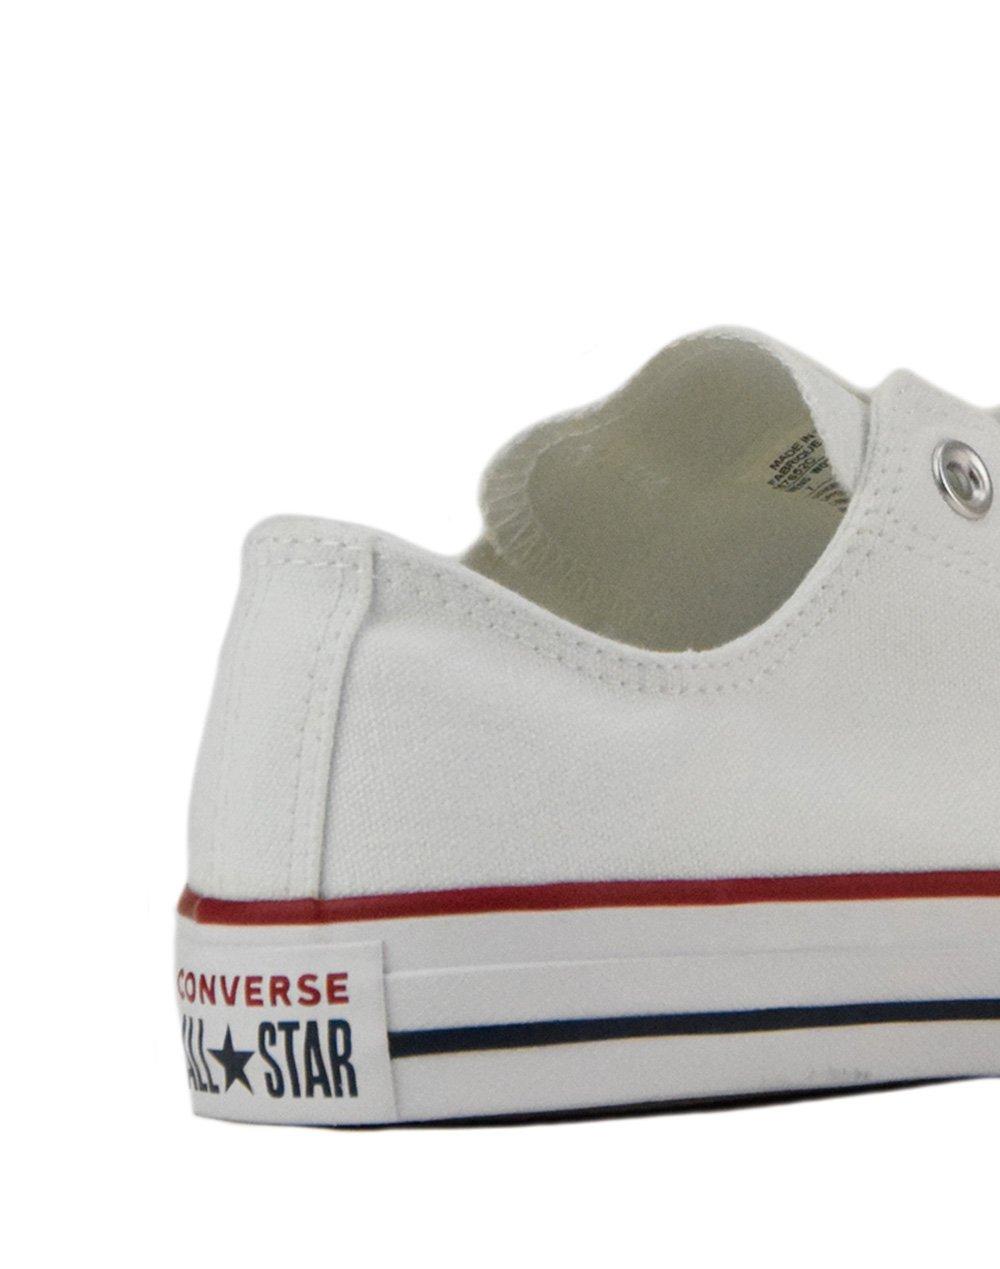 Converse Chuck Taylor All Star OX (M7652) Optical White